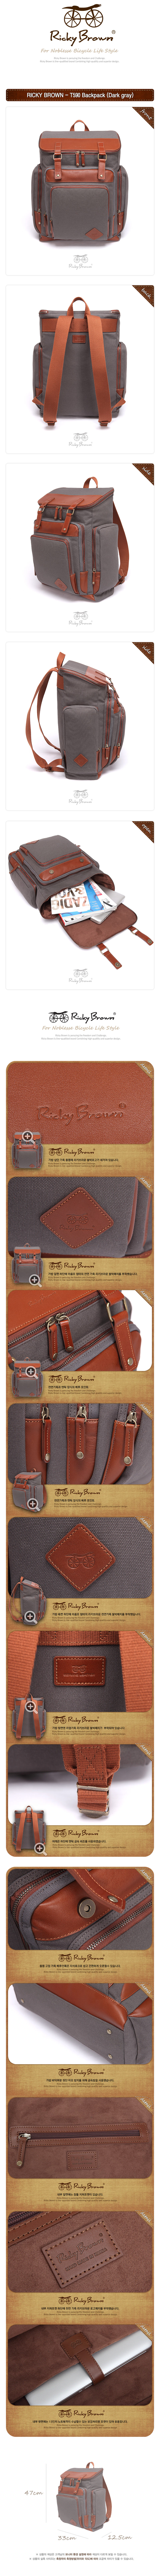 rickybrown-T590-backpack-(DARK-GRAY).jpg